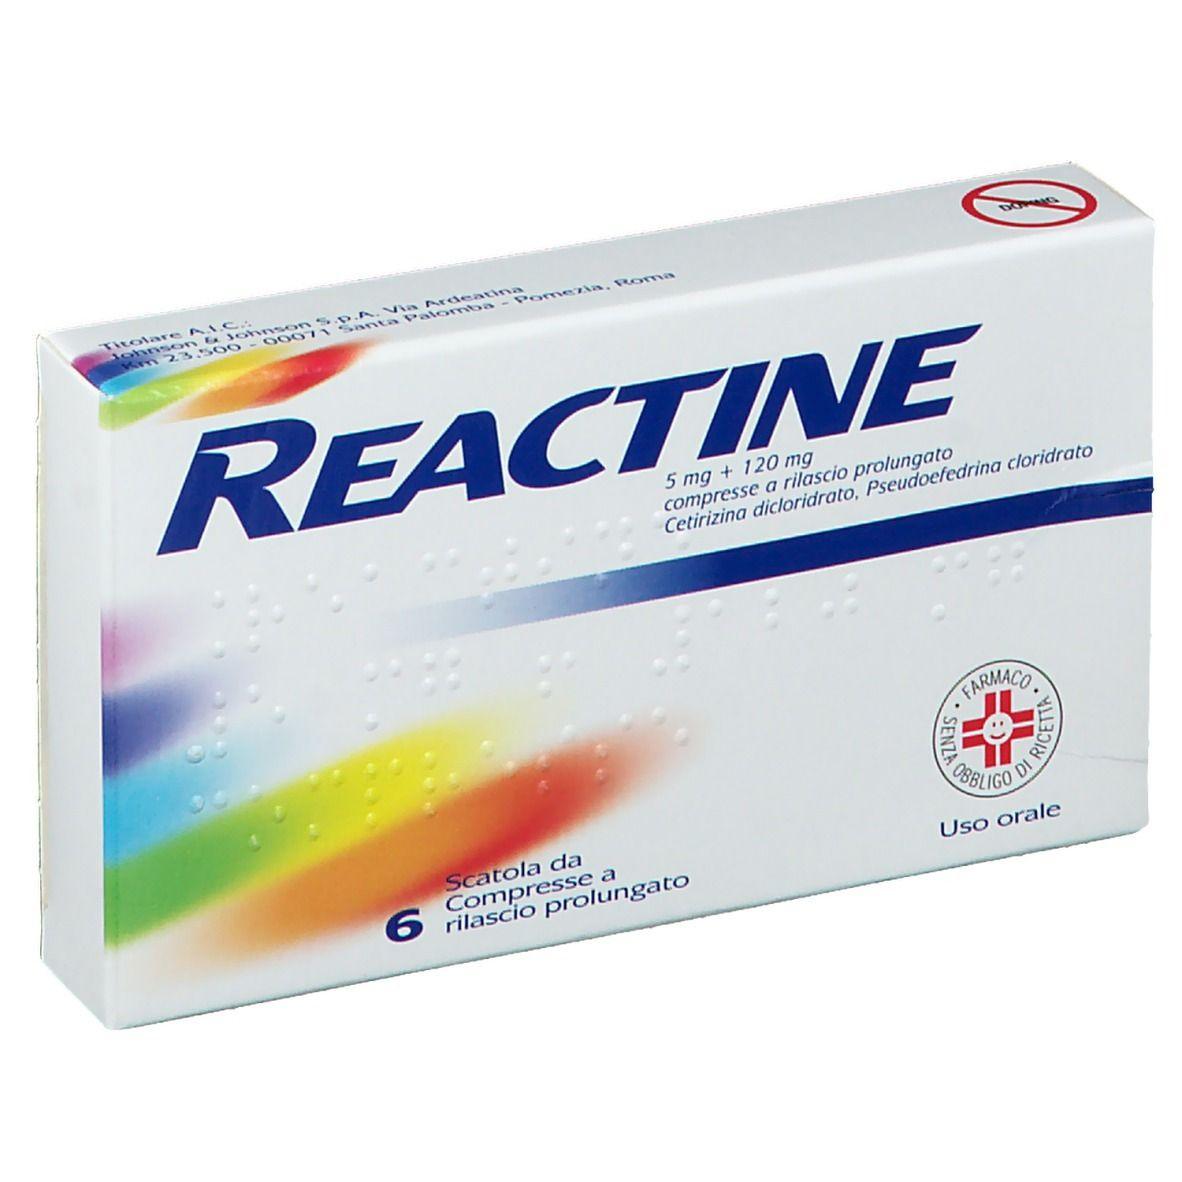 Reactine 5 mg + 120 mg Compresse